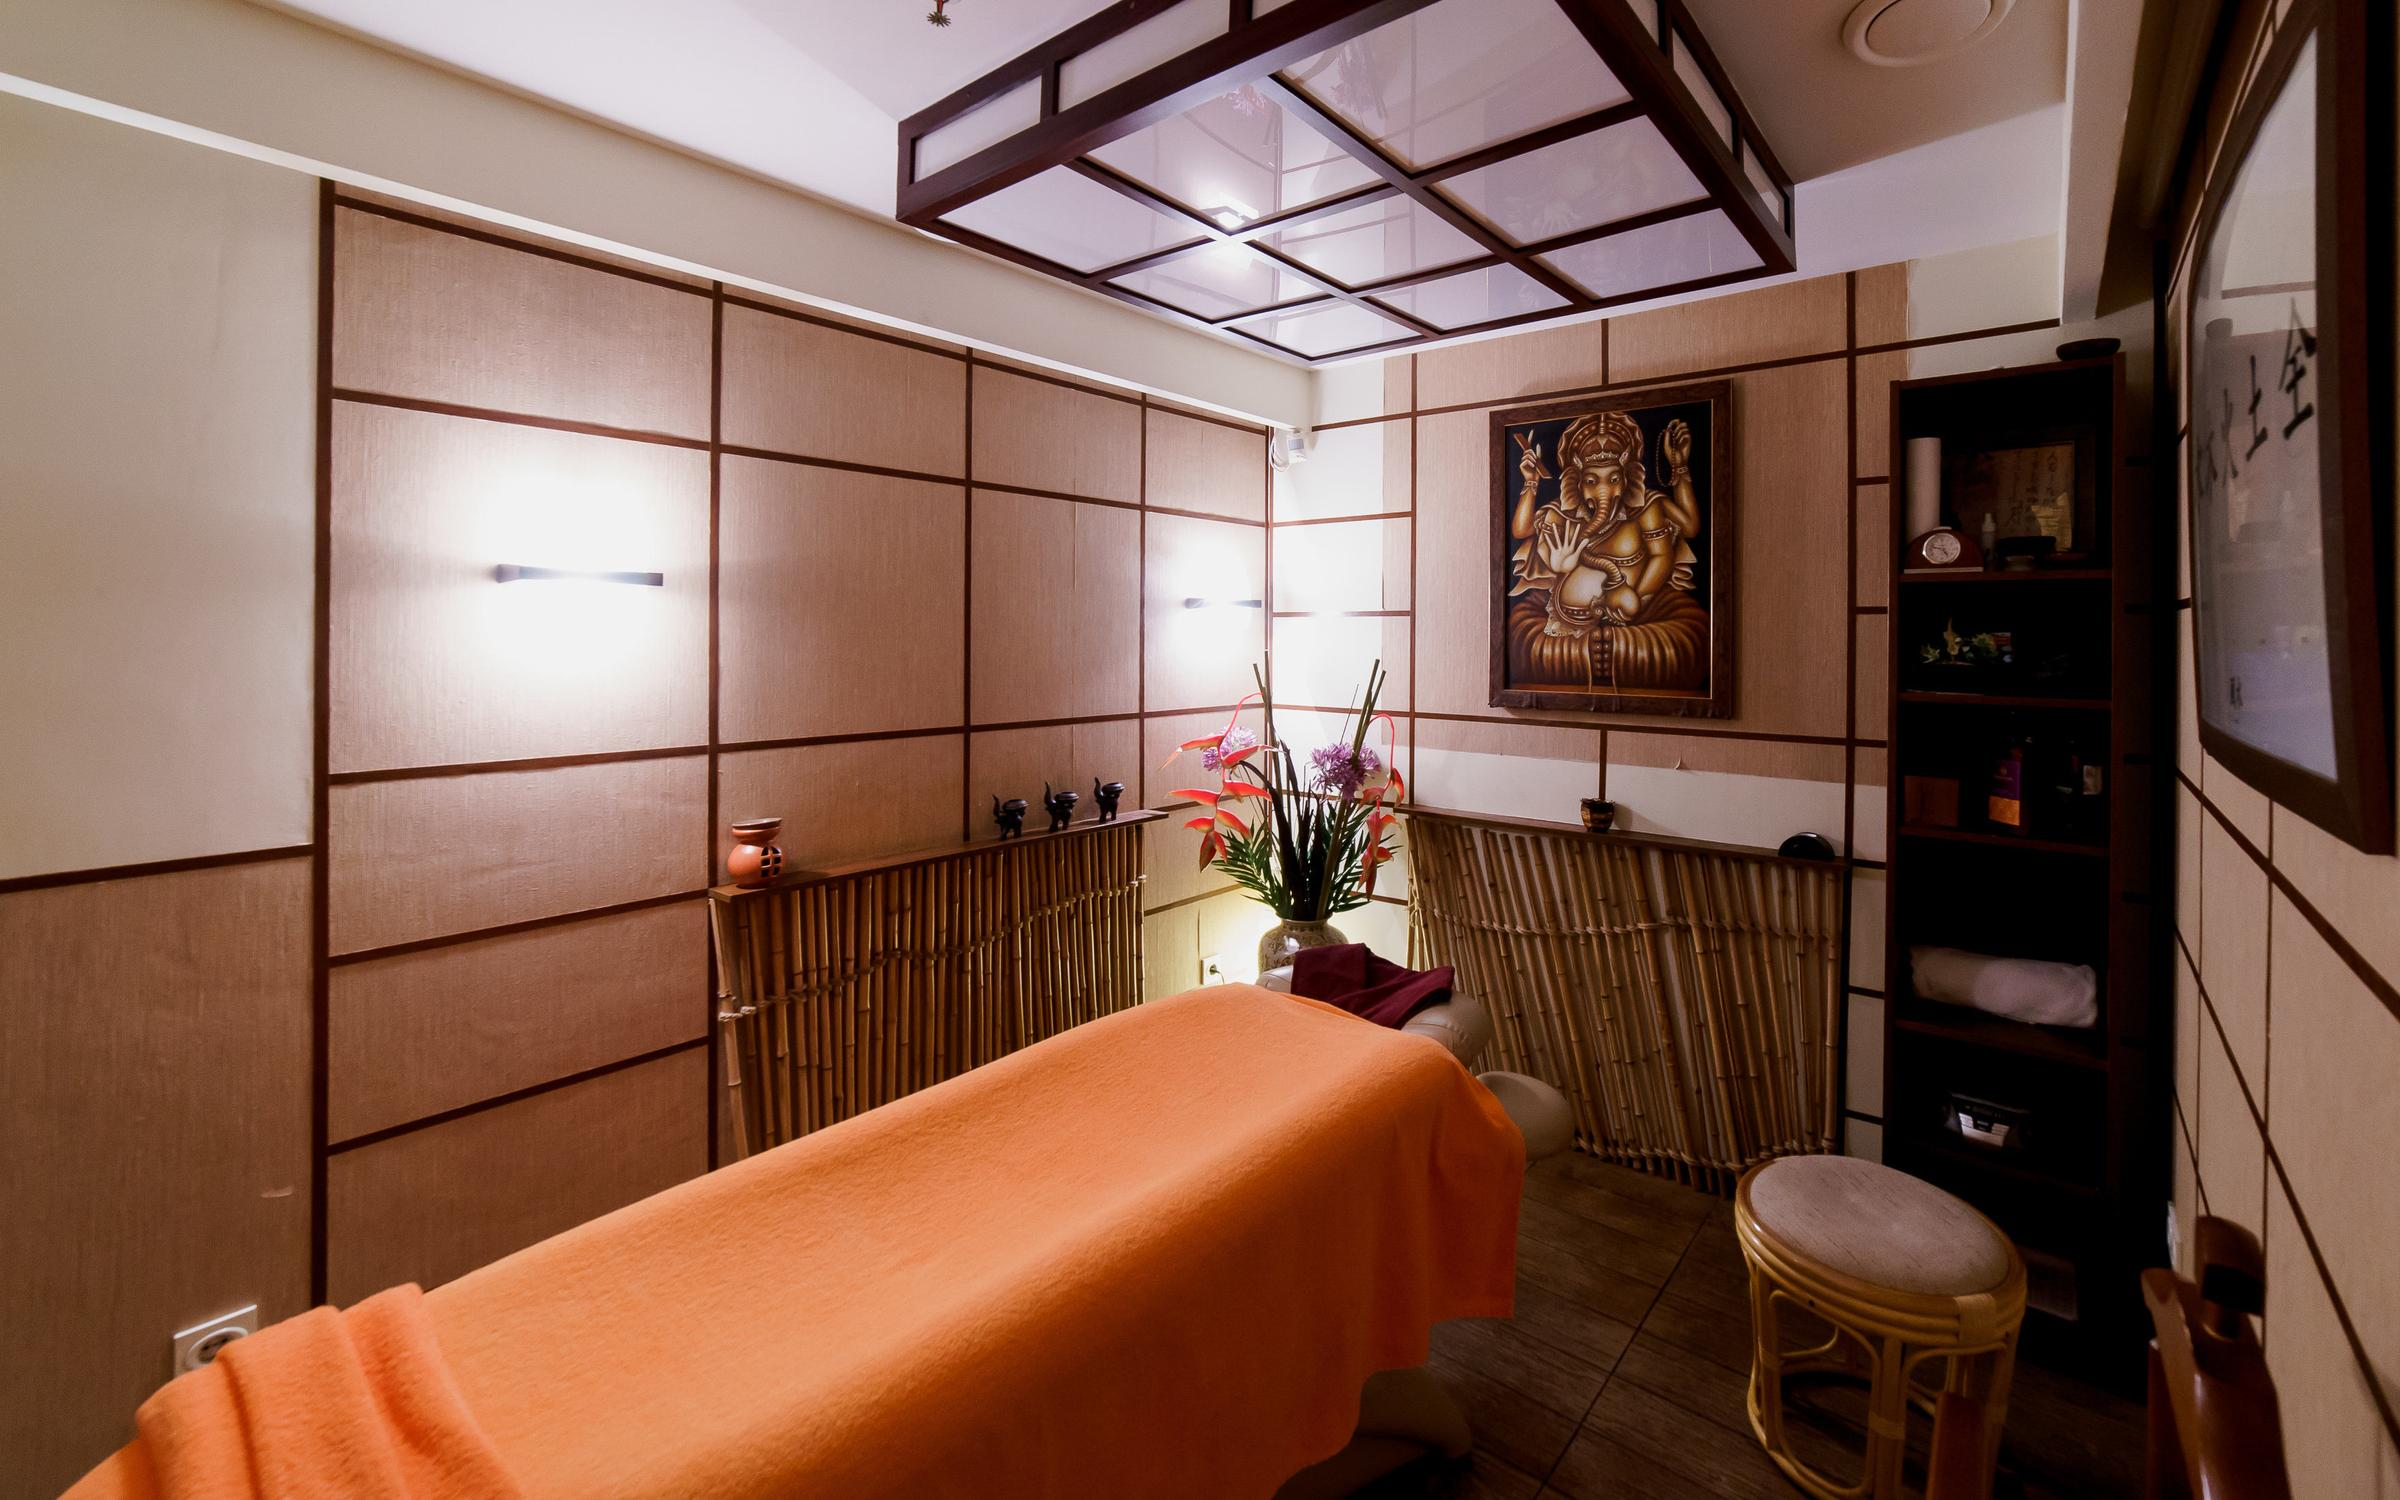 фотография Спа-салона Бали в ТЦ Золотая миля